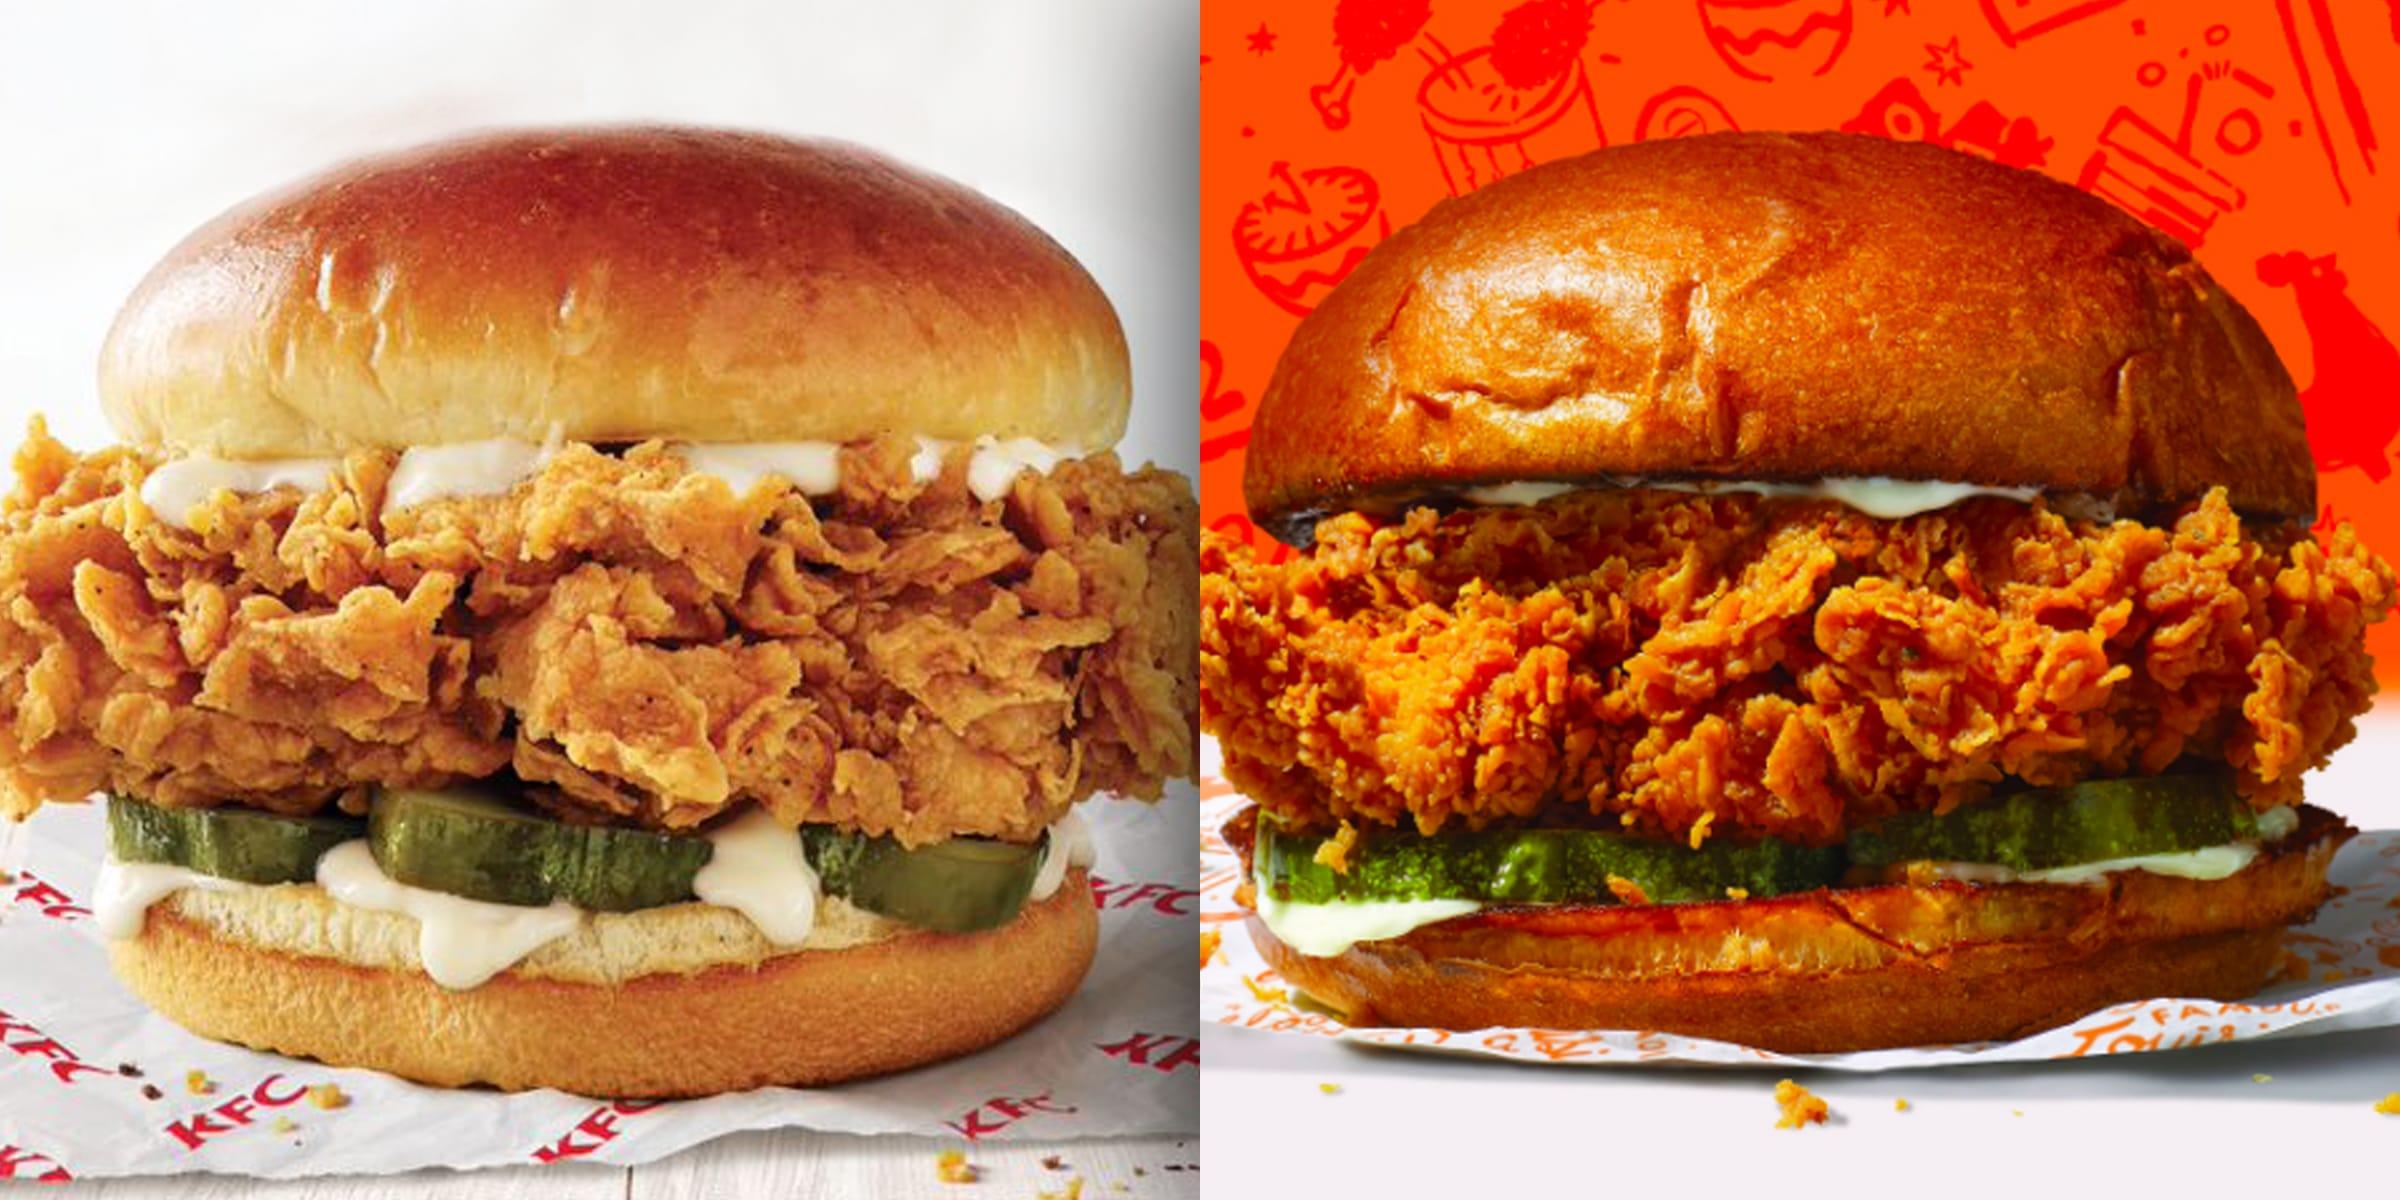 KFC is testing a chicken sandwich that's a lot like Popeyes' 14